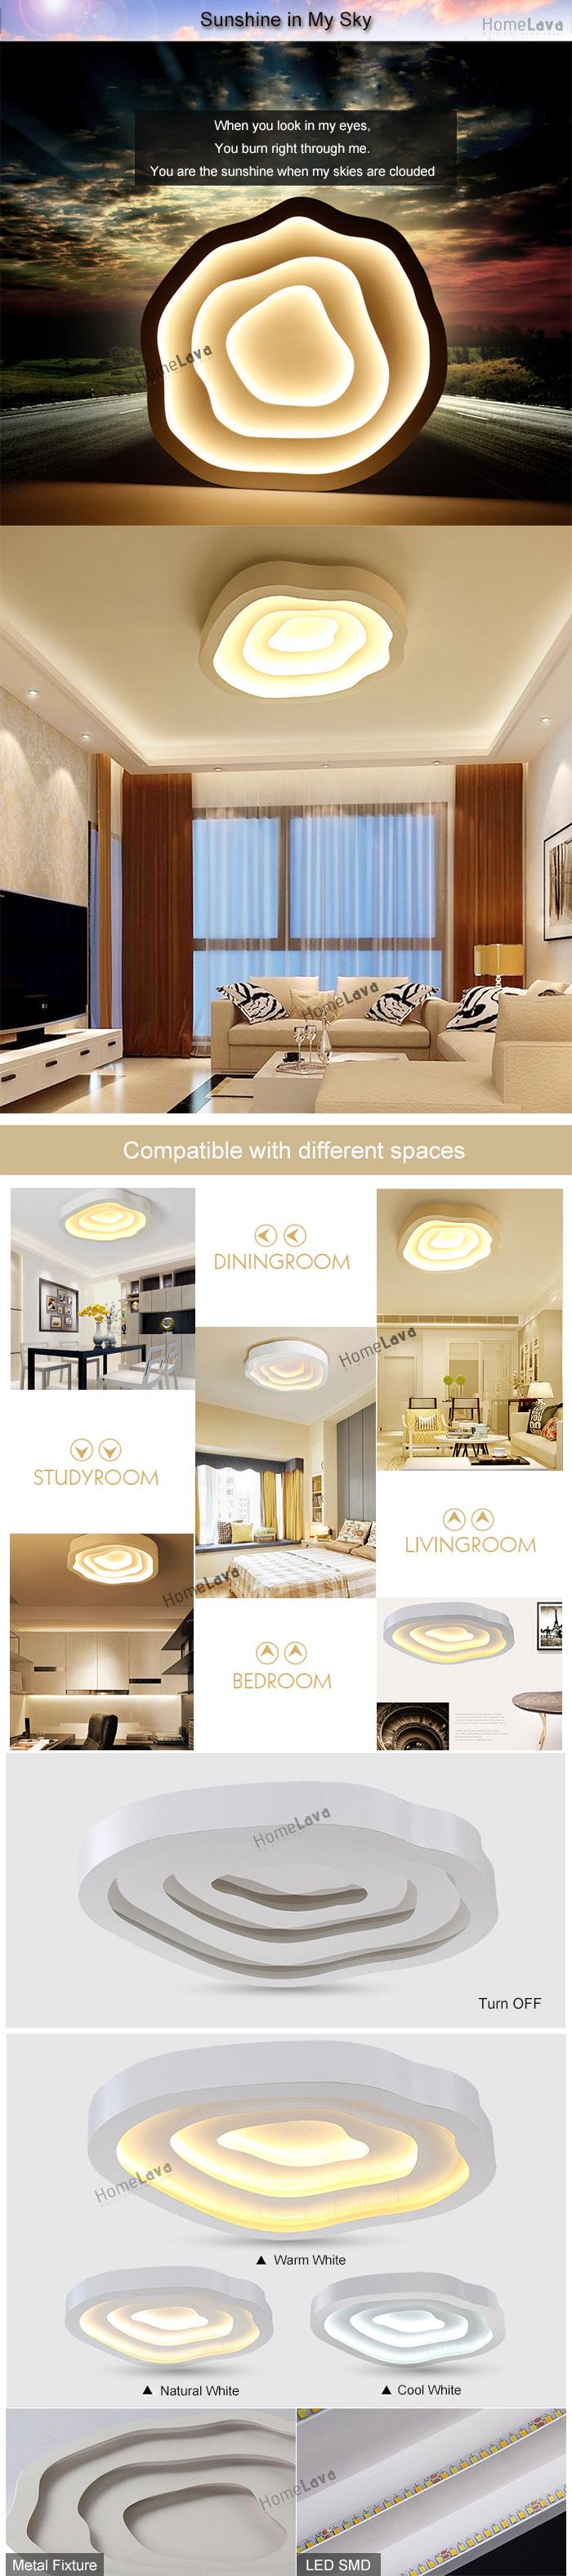 (In Stock) Modern Simple Fashion LED Metal White Flush Mount Light Living Room Bedroom Study Room Dining Room Energy Saving(Sunshine In My Sky)